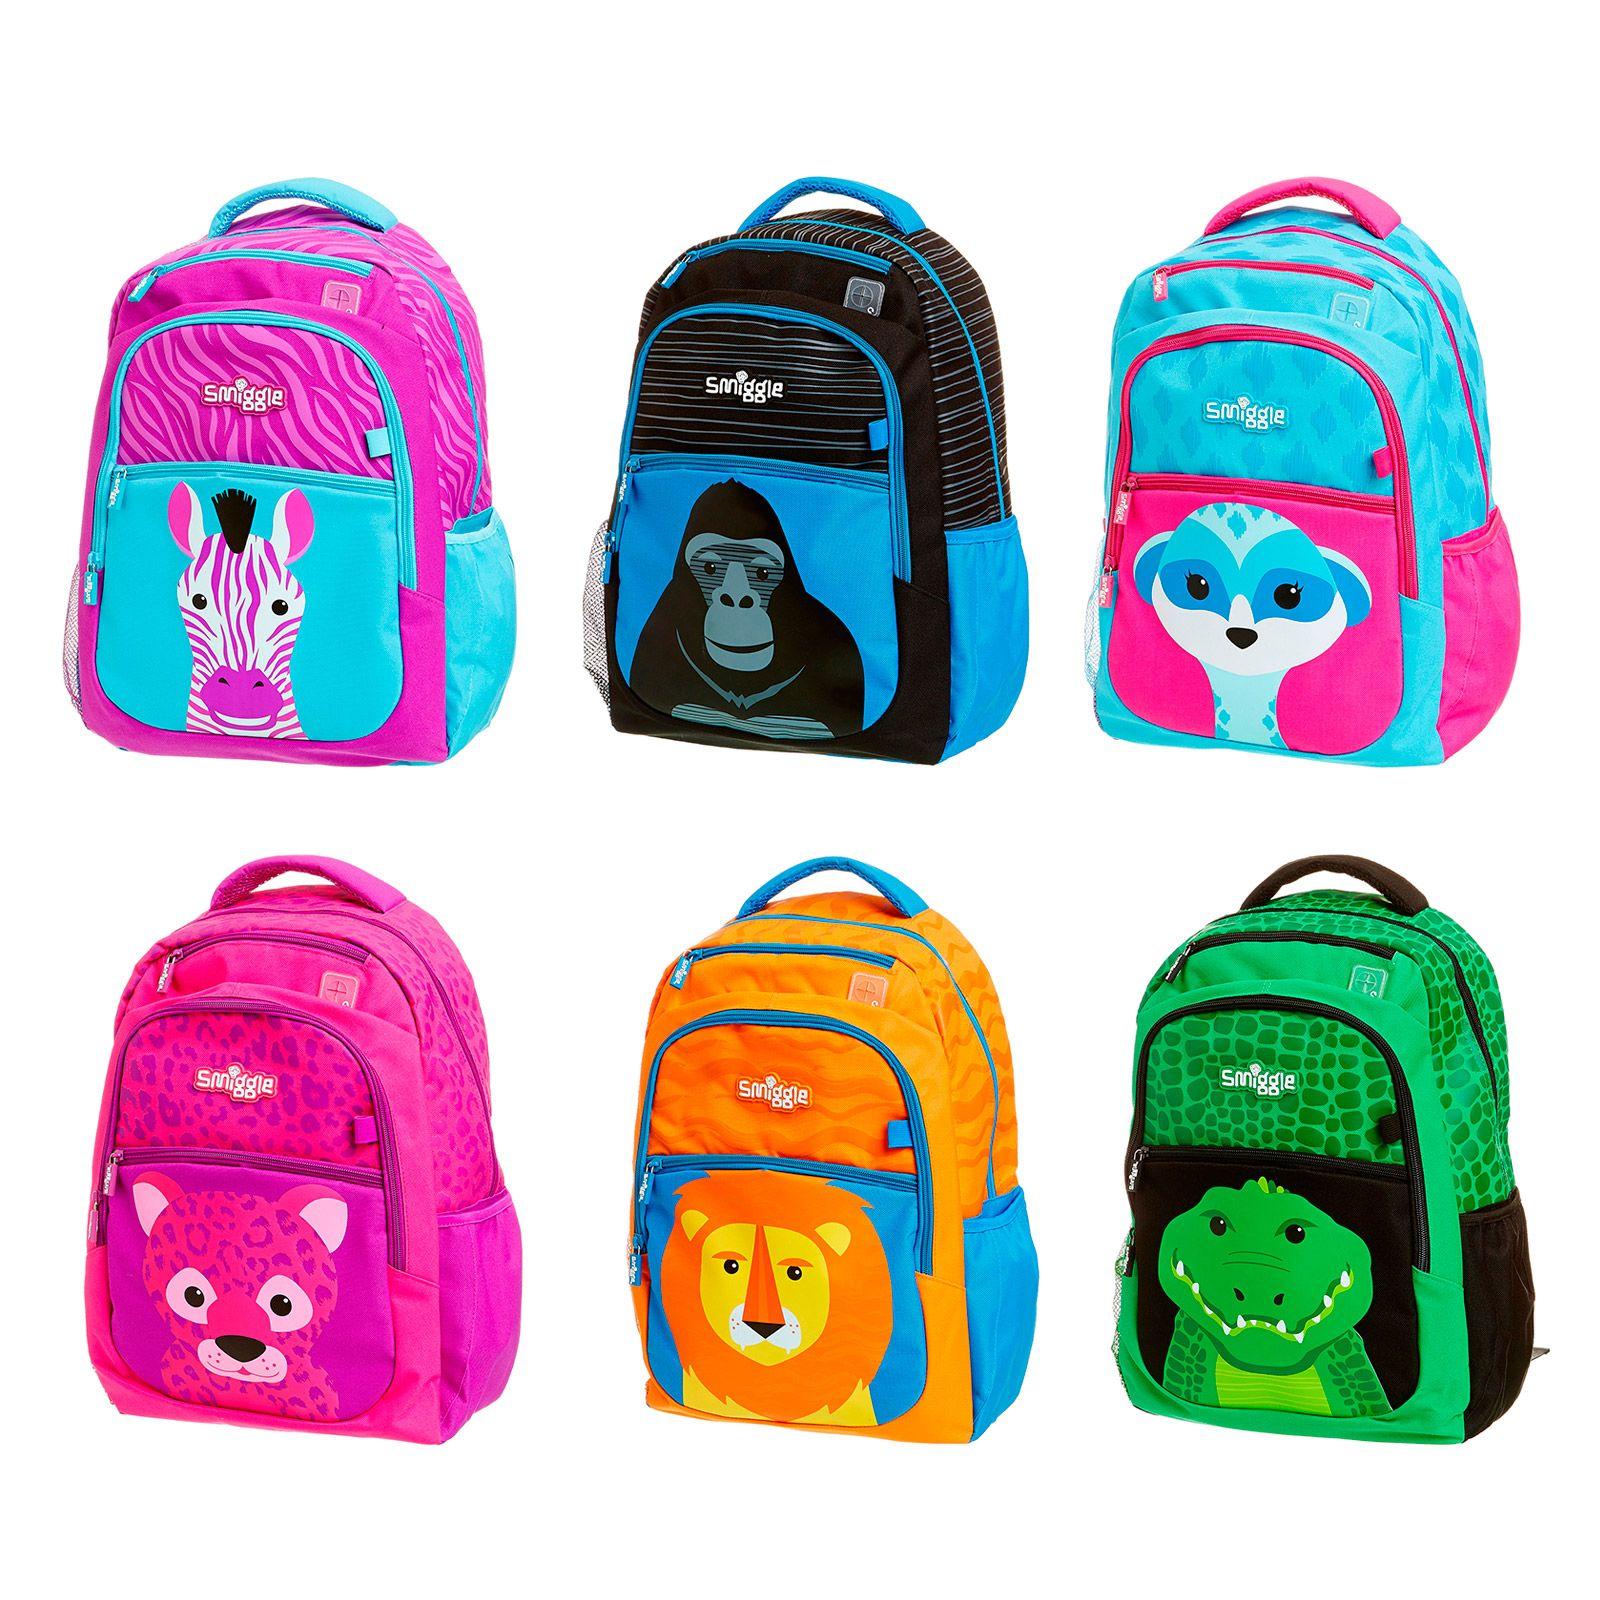 Smiggle bags for school - Safari Backpack Smiggle Uk